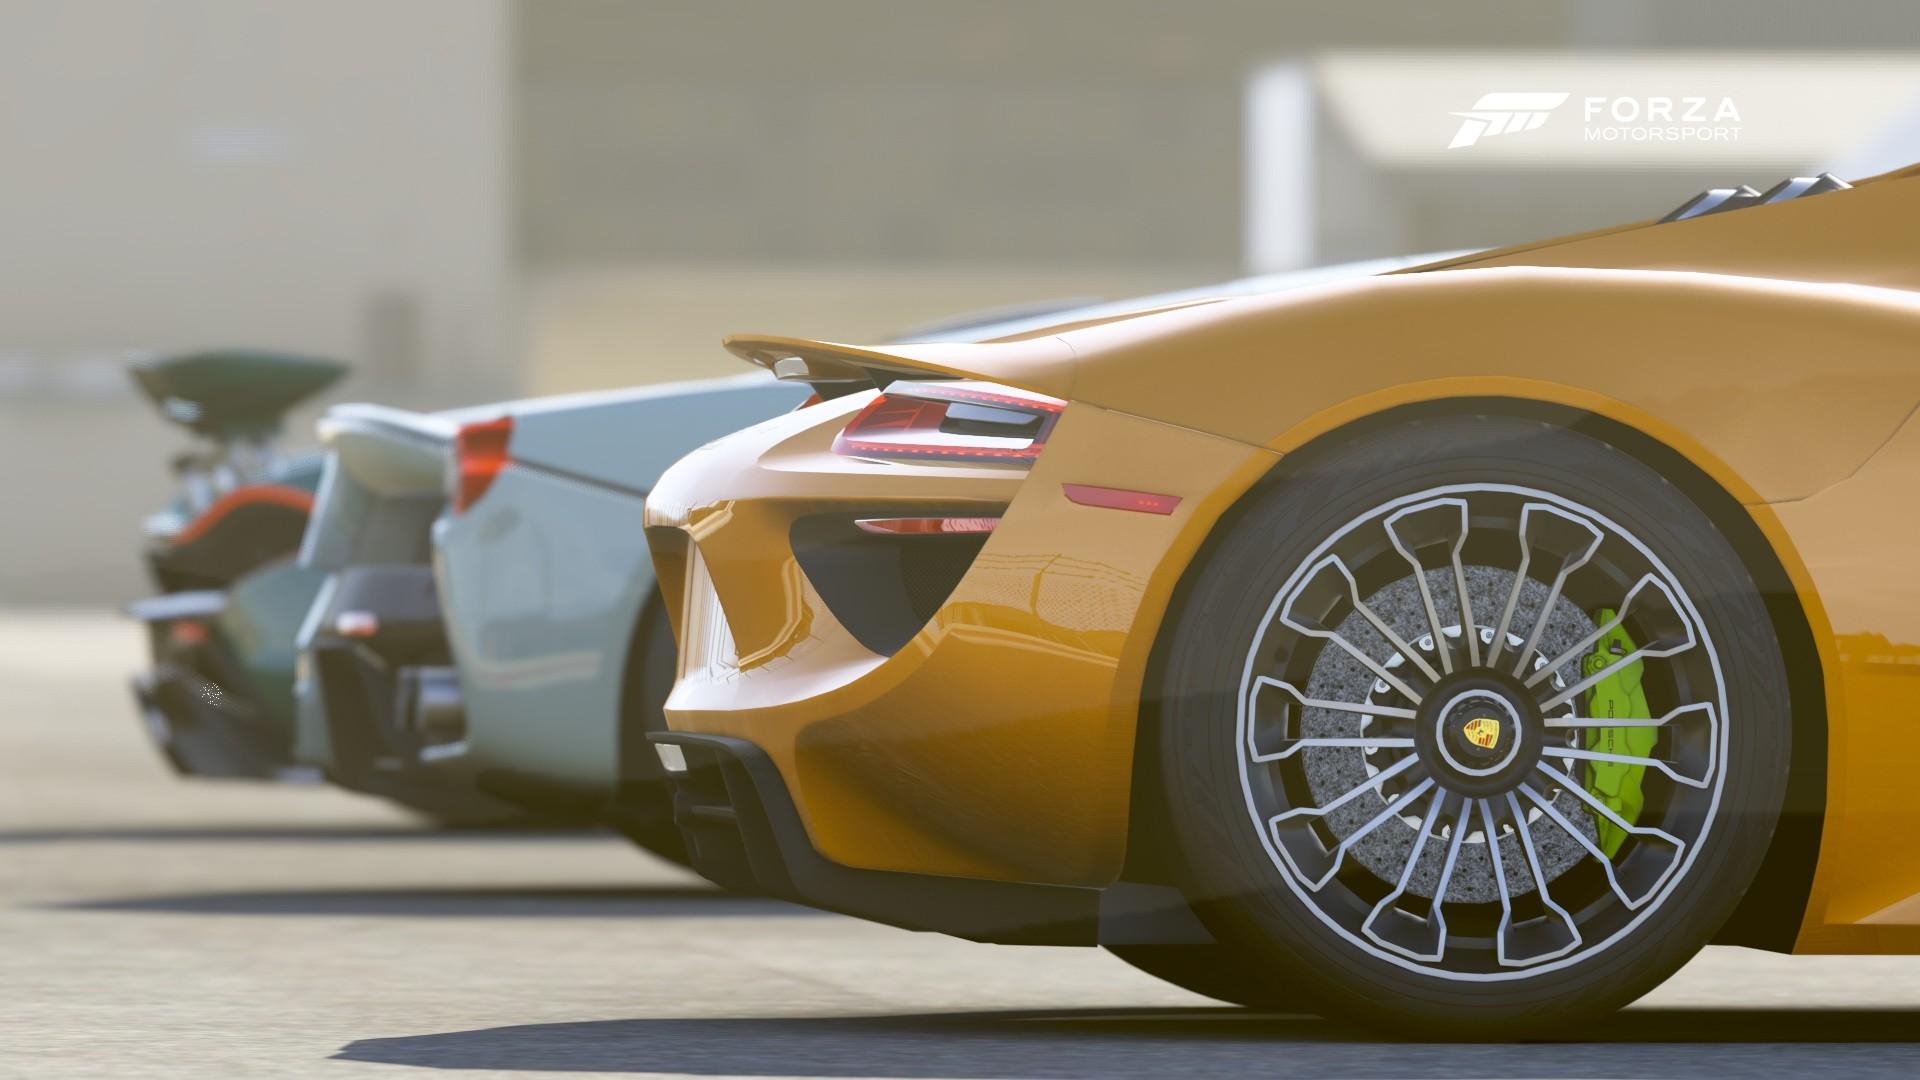 Wallpaper Race Cars Shadow Cgi Porsche Mclaren P1